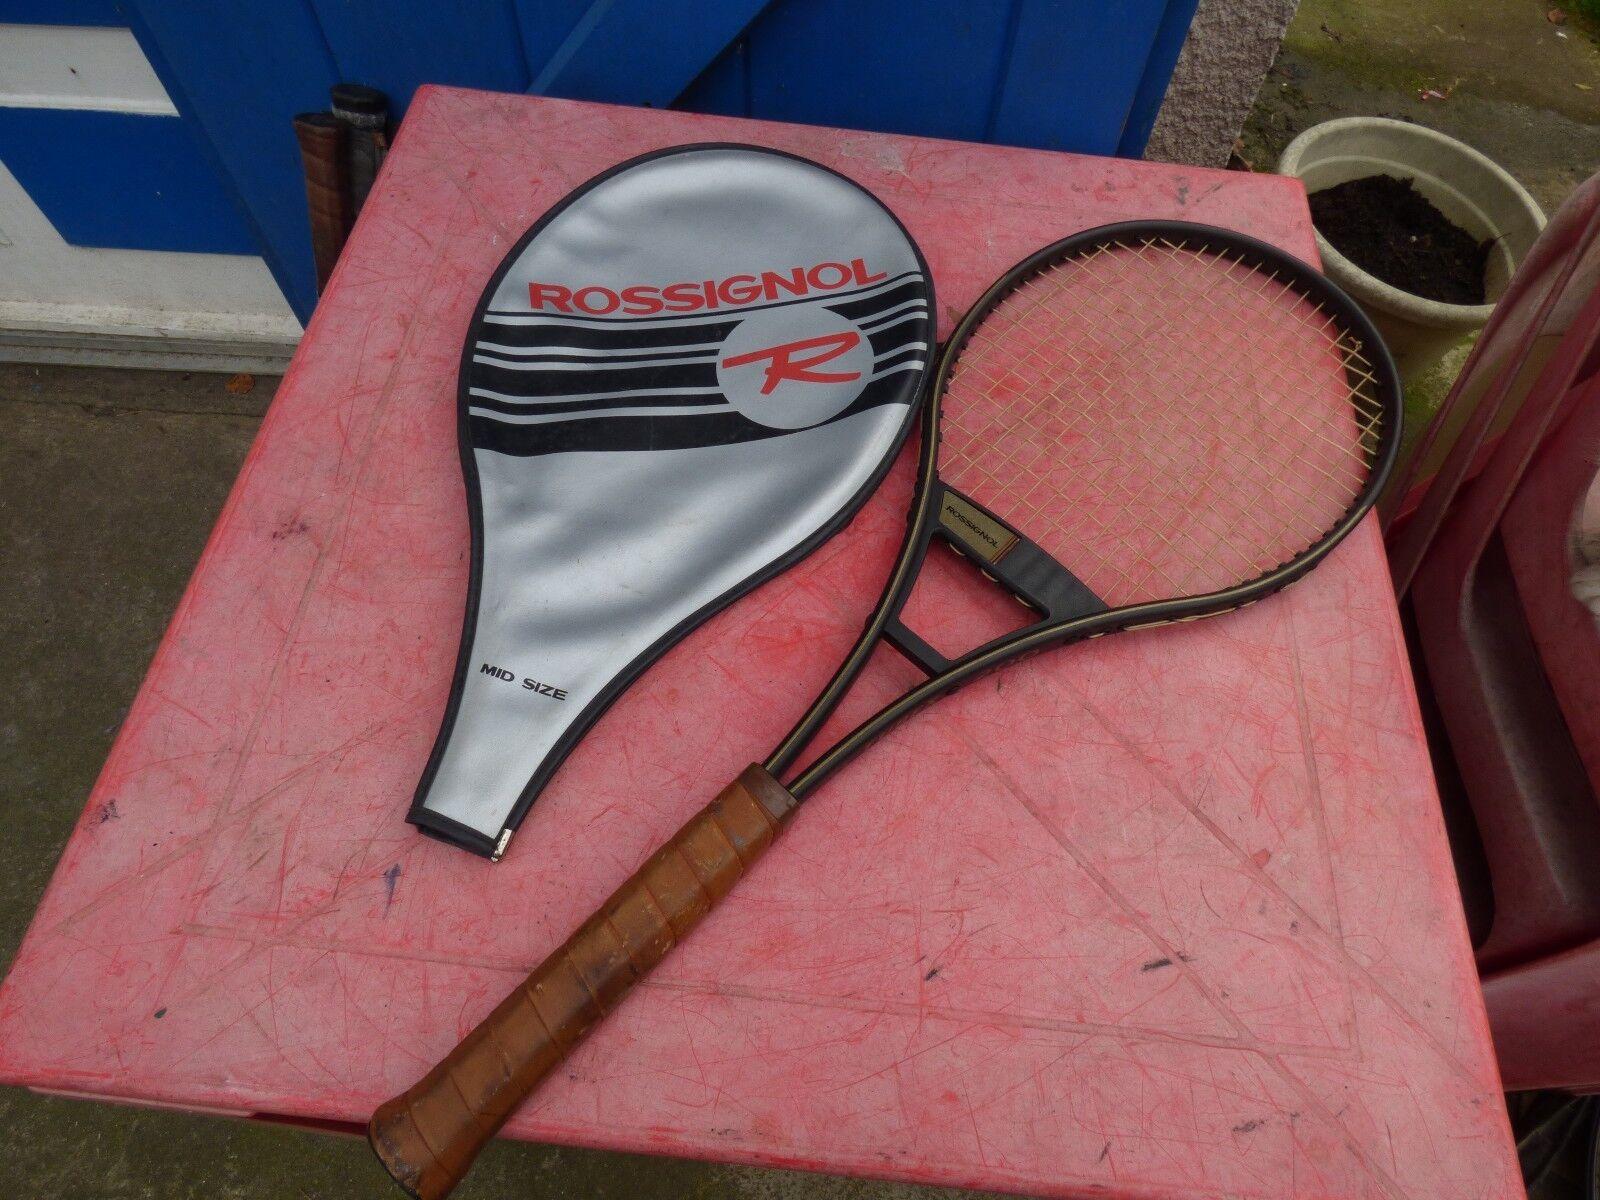 Raquette de tennis vintage Rossignol Tubex 200 made in USA  avec housse